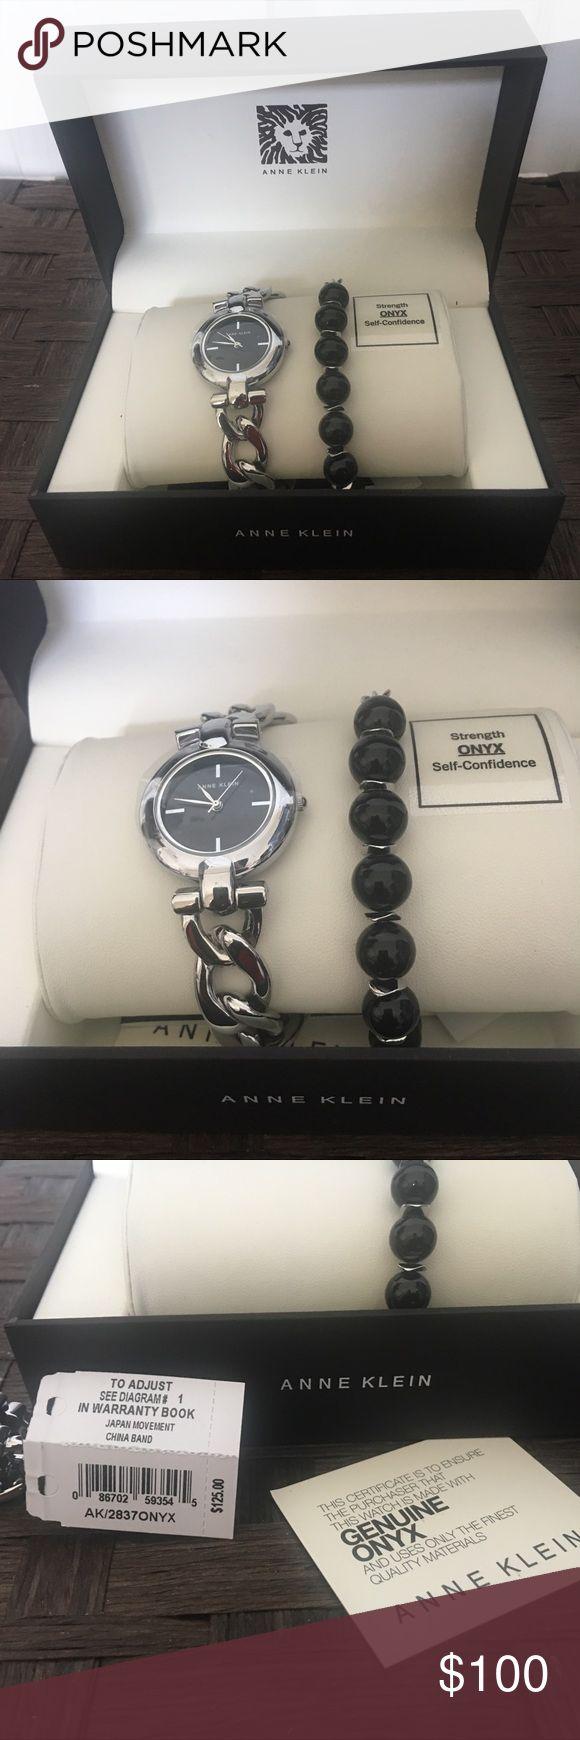 ANNE KLEIN WATCH & BRACELET Anne Klein Ak/2837onyx Womens Silver-tone Watch And Onyx Beaded Anne Klein Accessories Watches